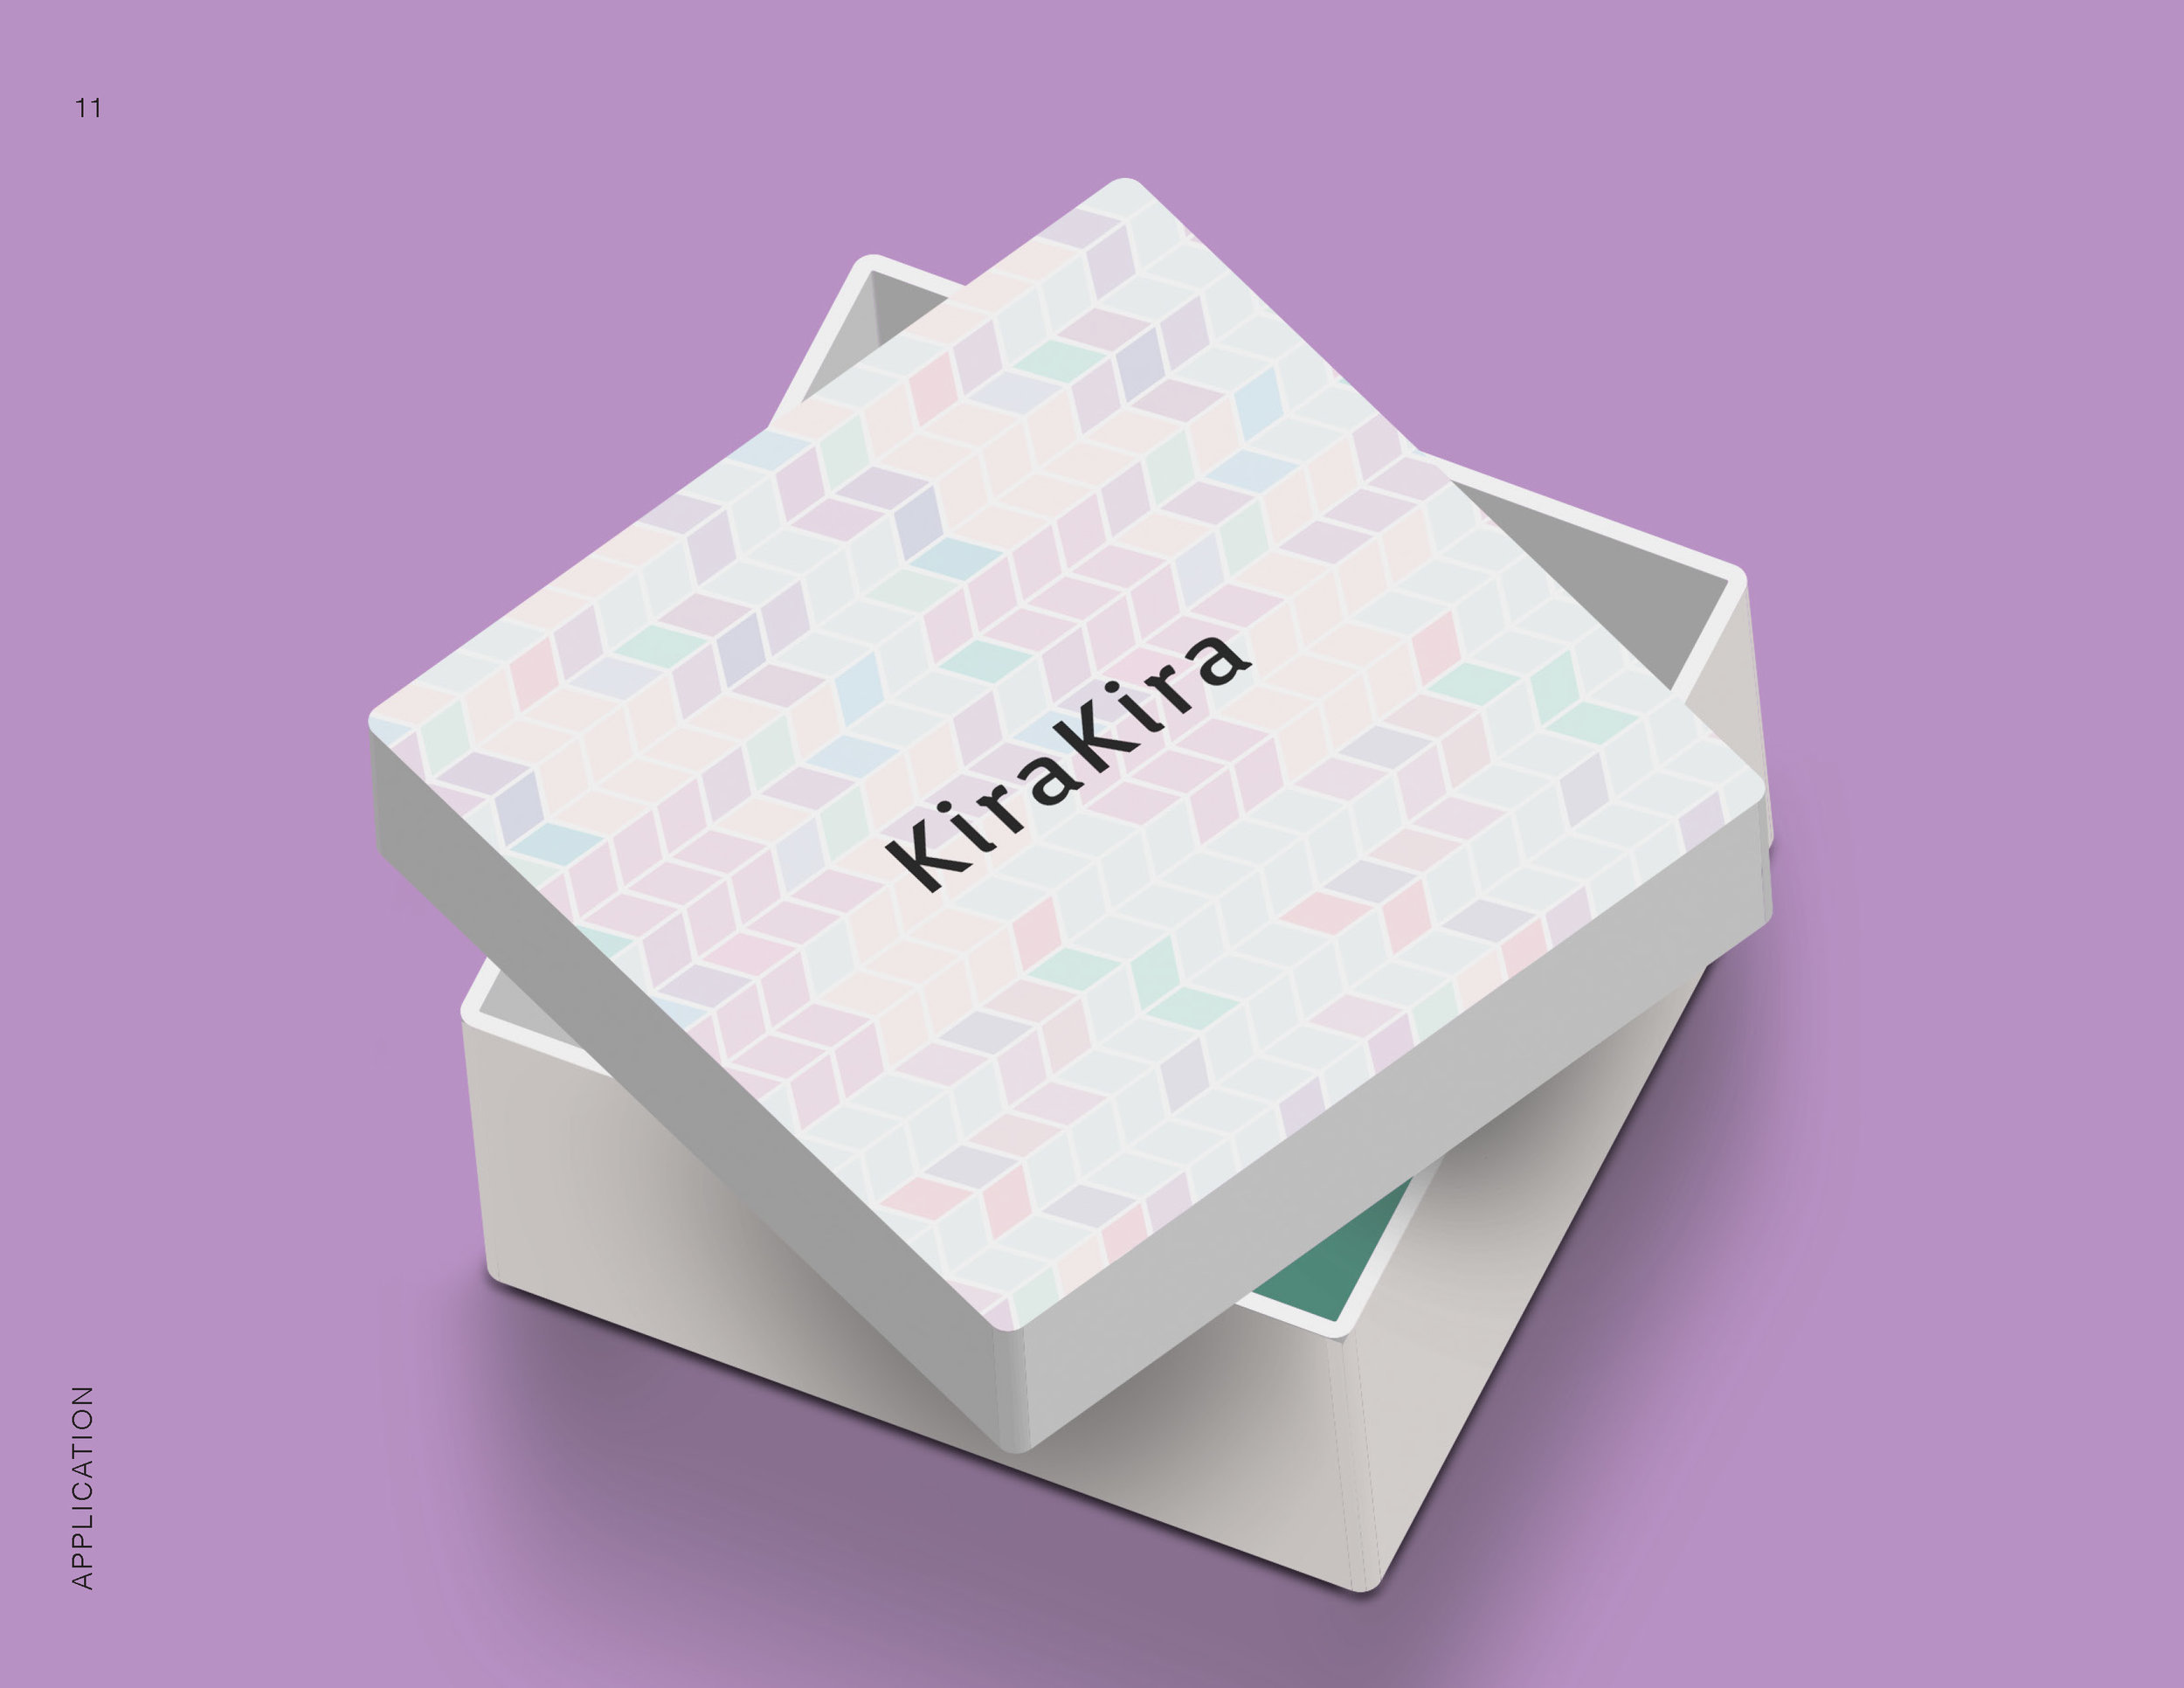 kirakira-brand-guide_Page_11.jpg